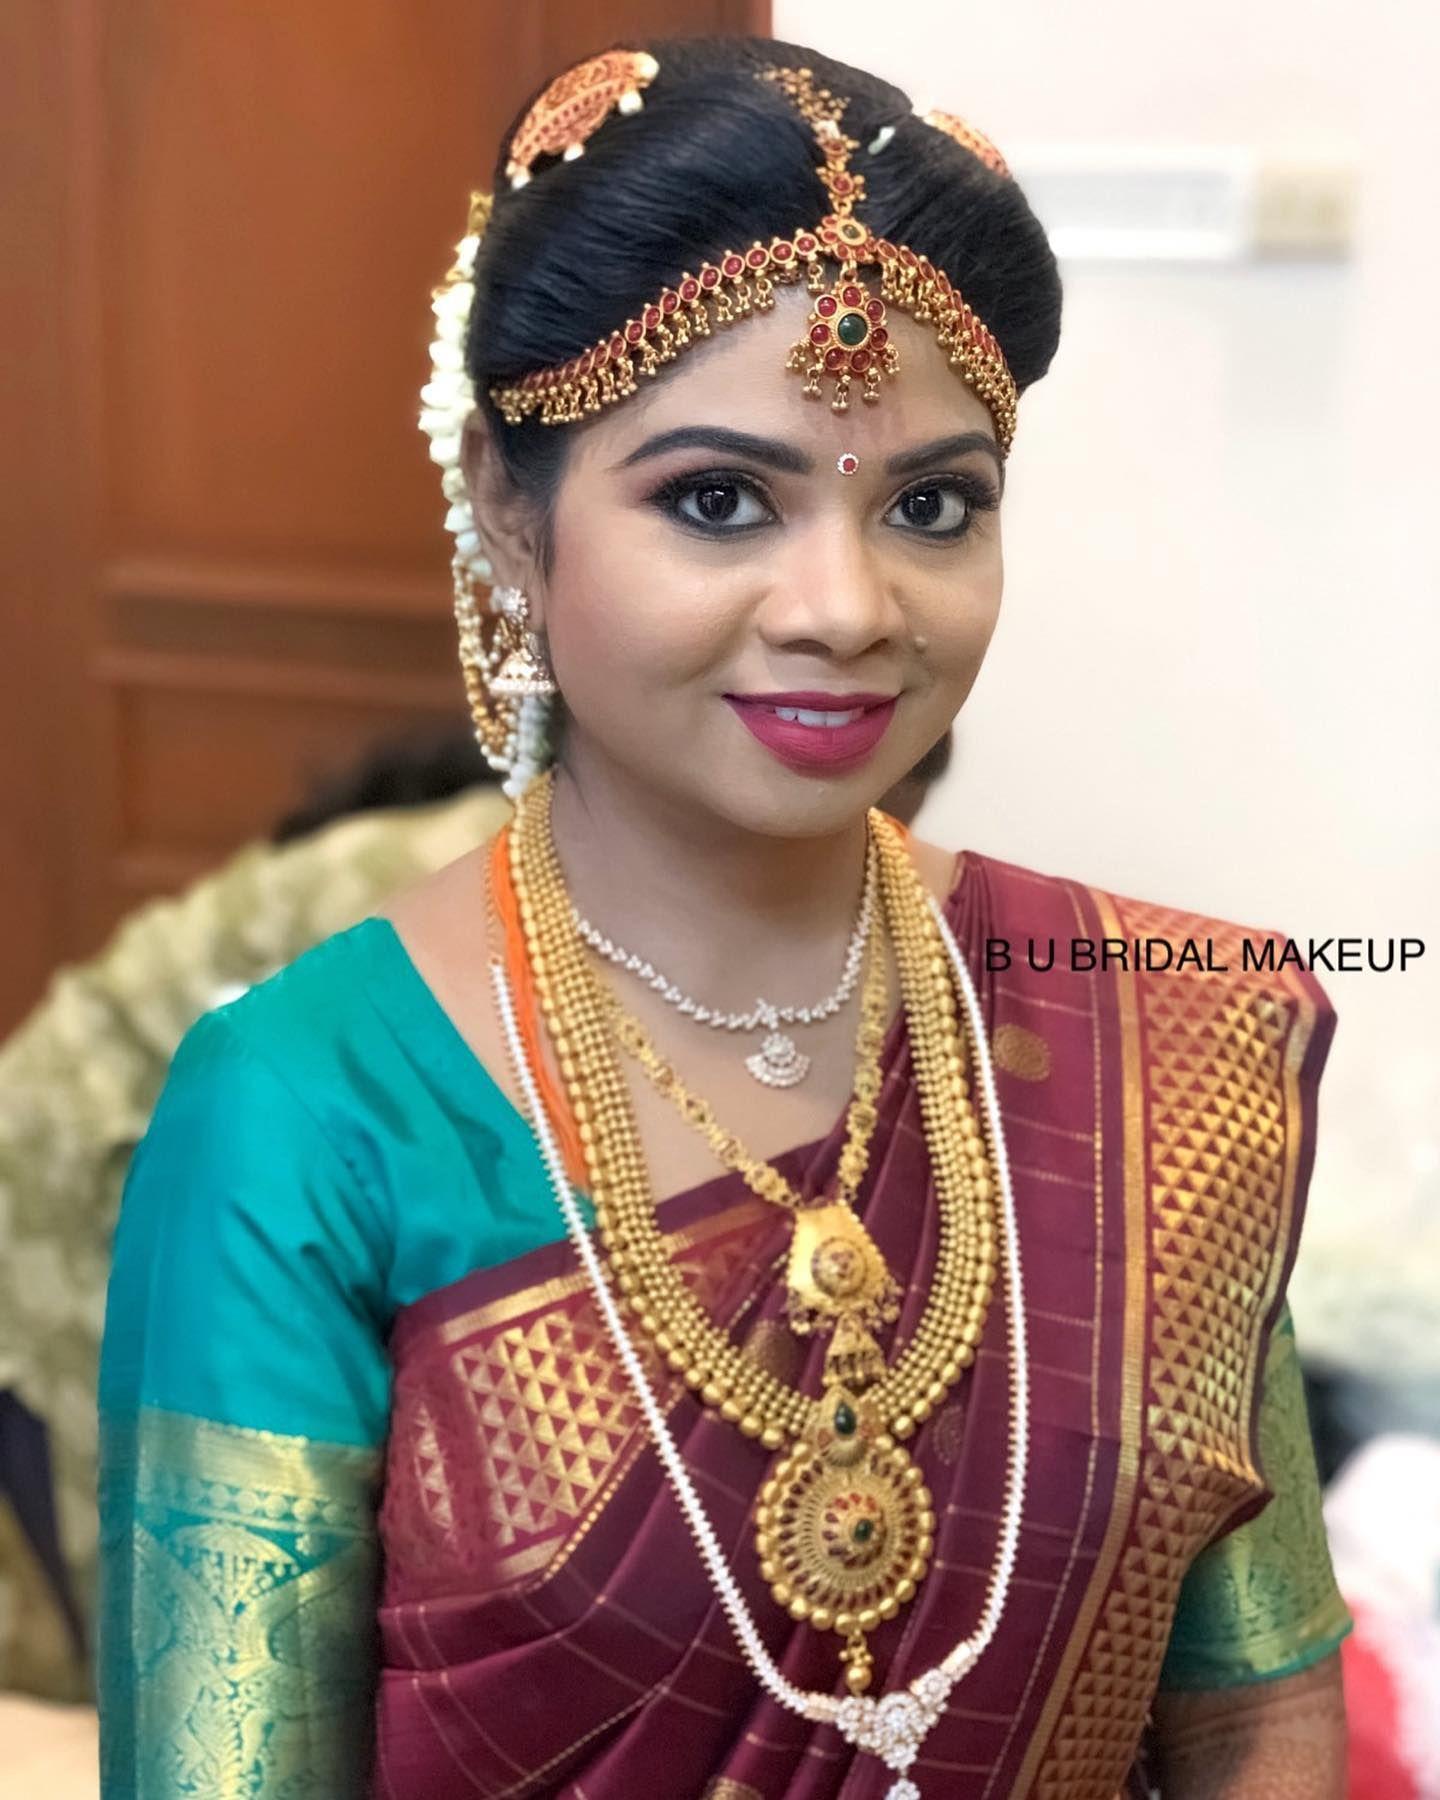 Bride Bhuvana Wedding Reception Chennai Makeup Airbrush Temptuairbrush Tnagar Tamilnadu Hairstyle Mua Chenna Bridal Makeup Bridal Temptu Airbrush